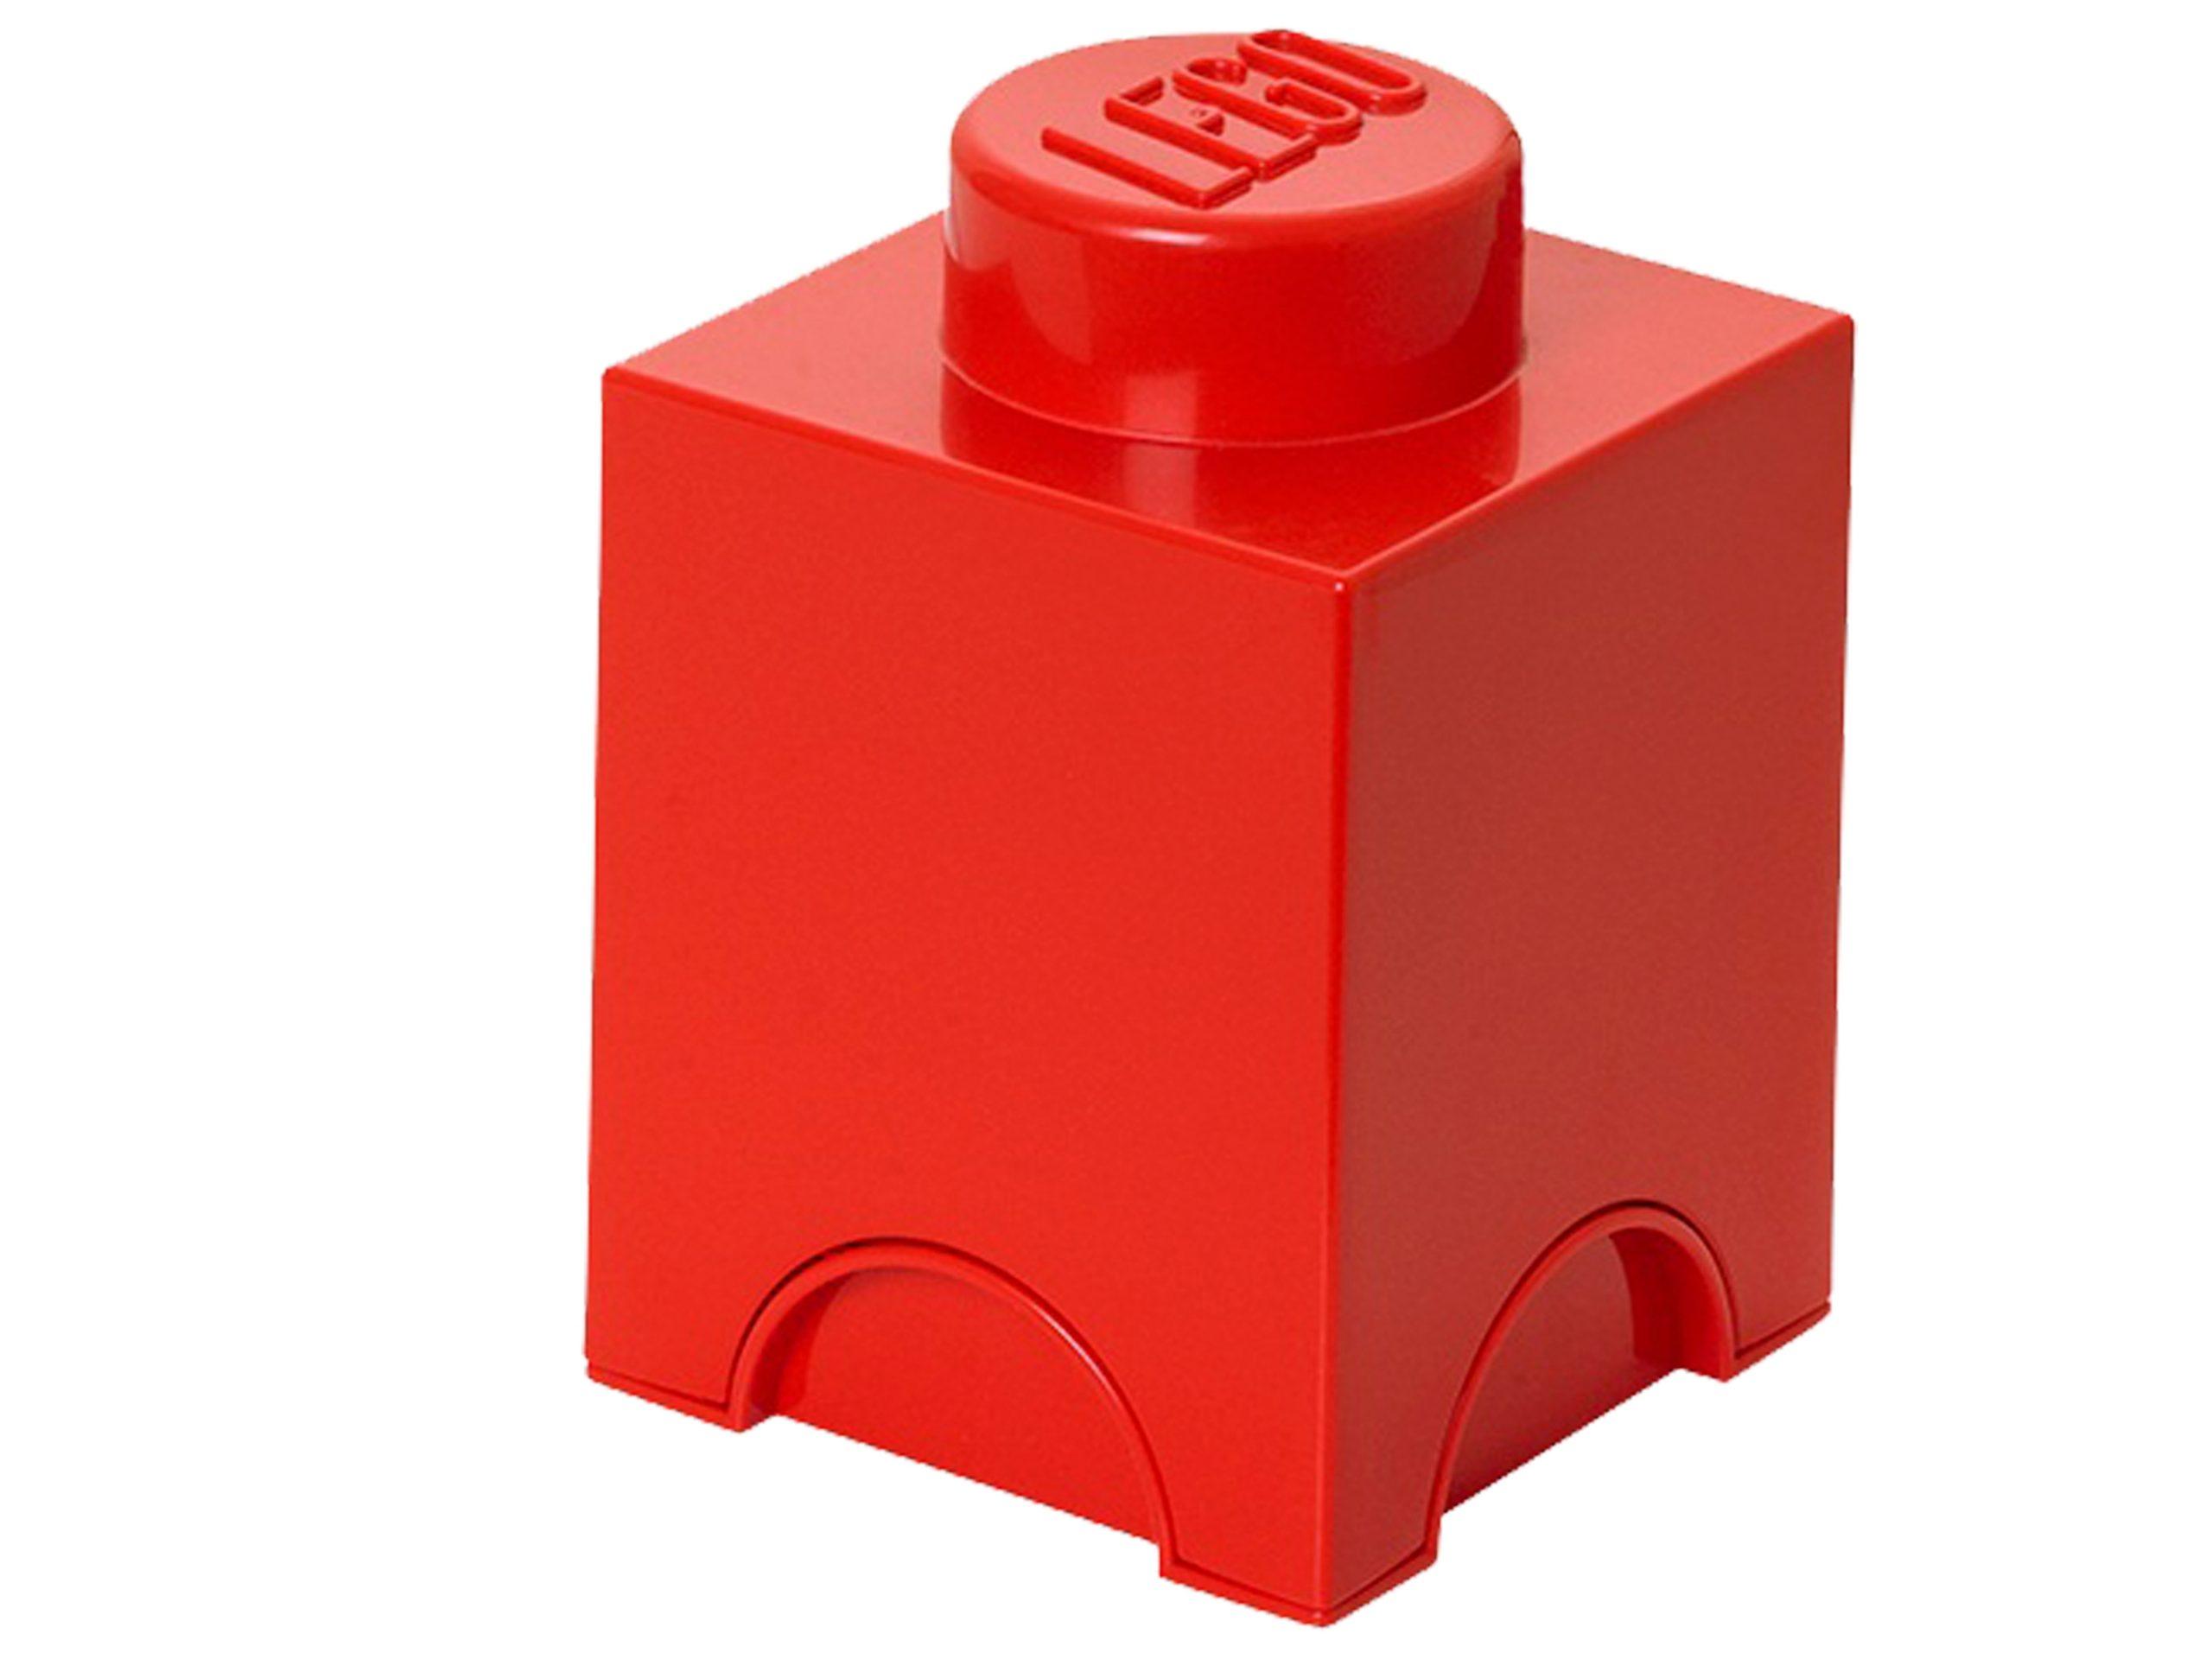 lego 5004267 1 stud red storage brick scaled